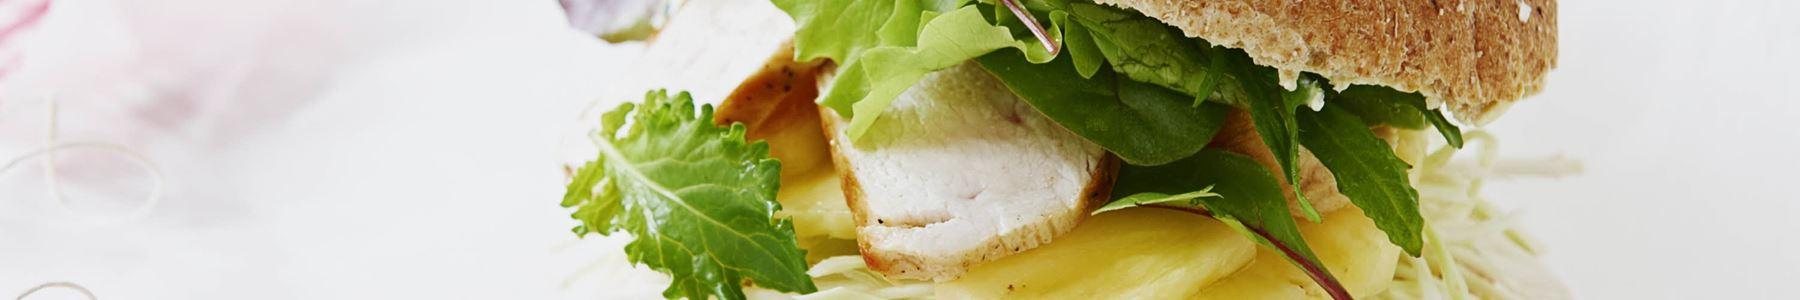 Ananas + Sandwich